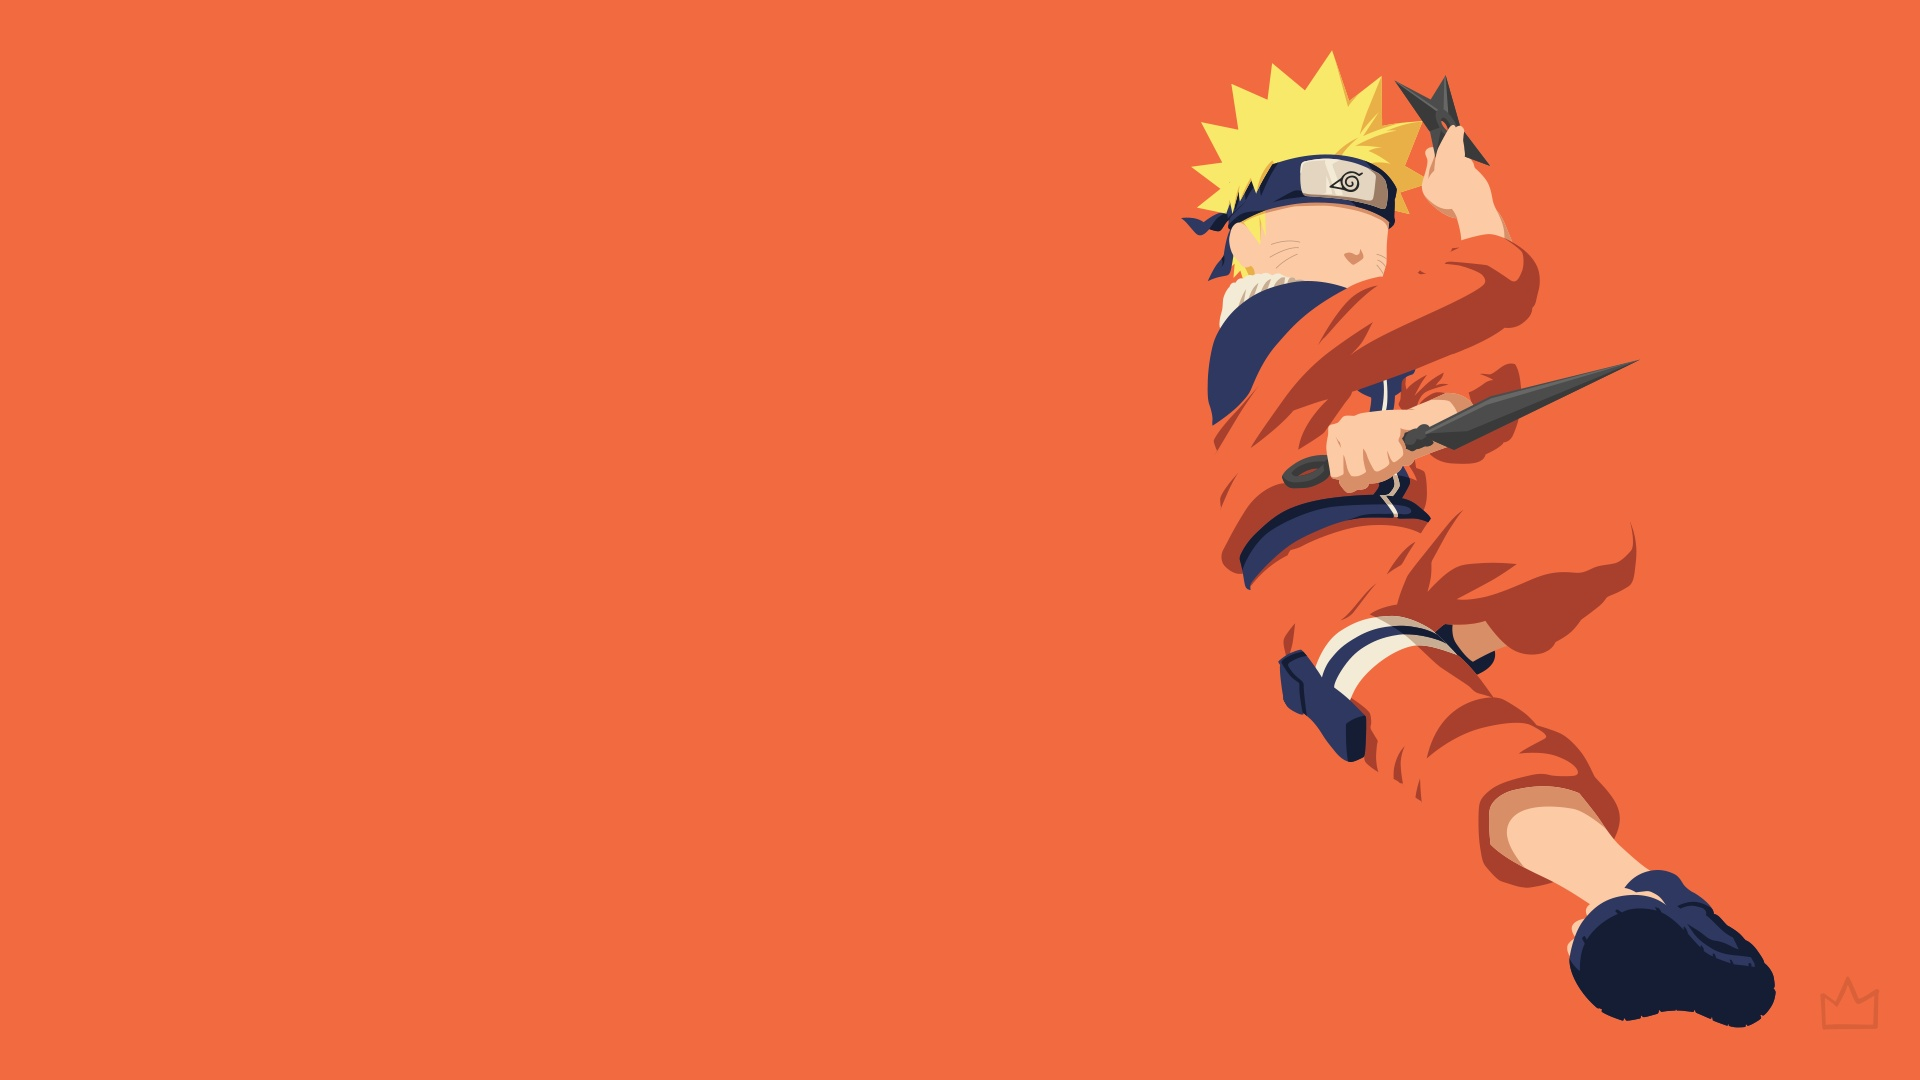 Naruto free wallpaper